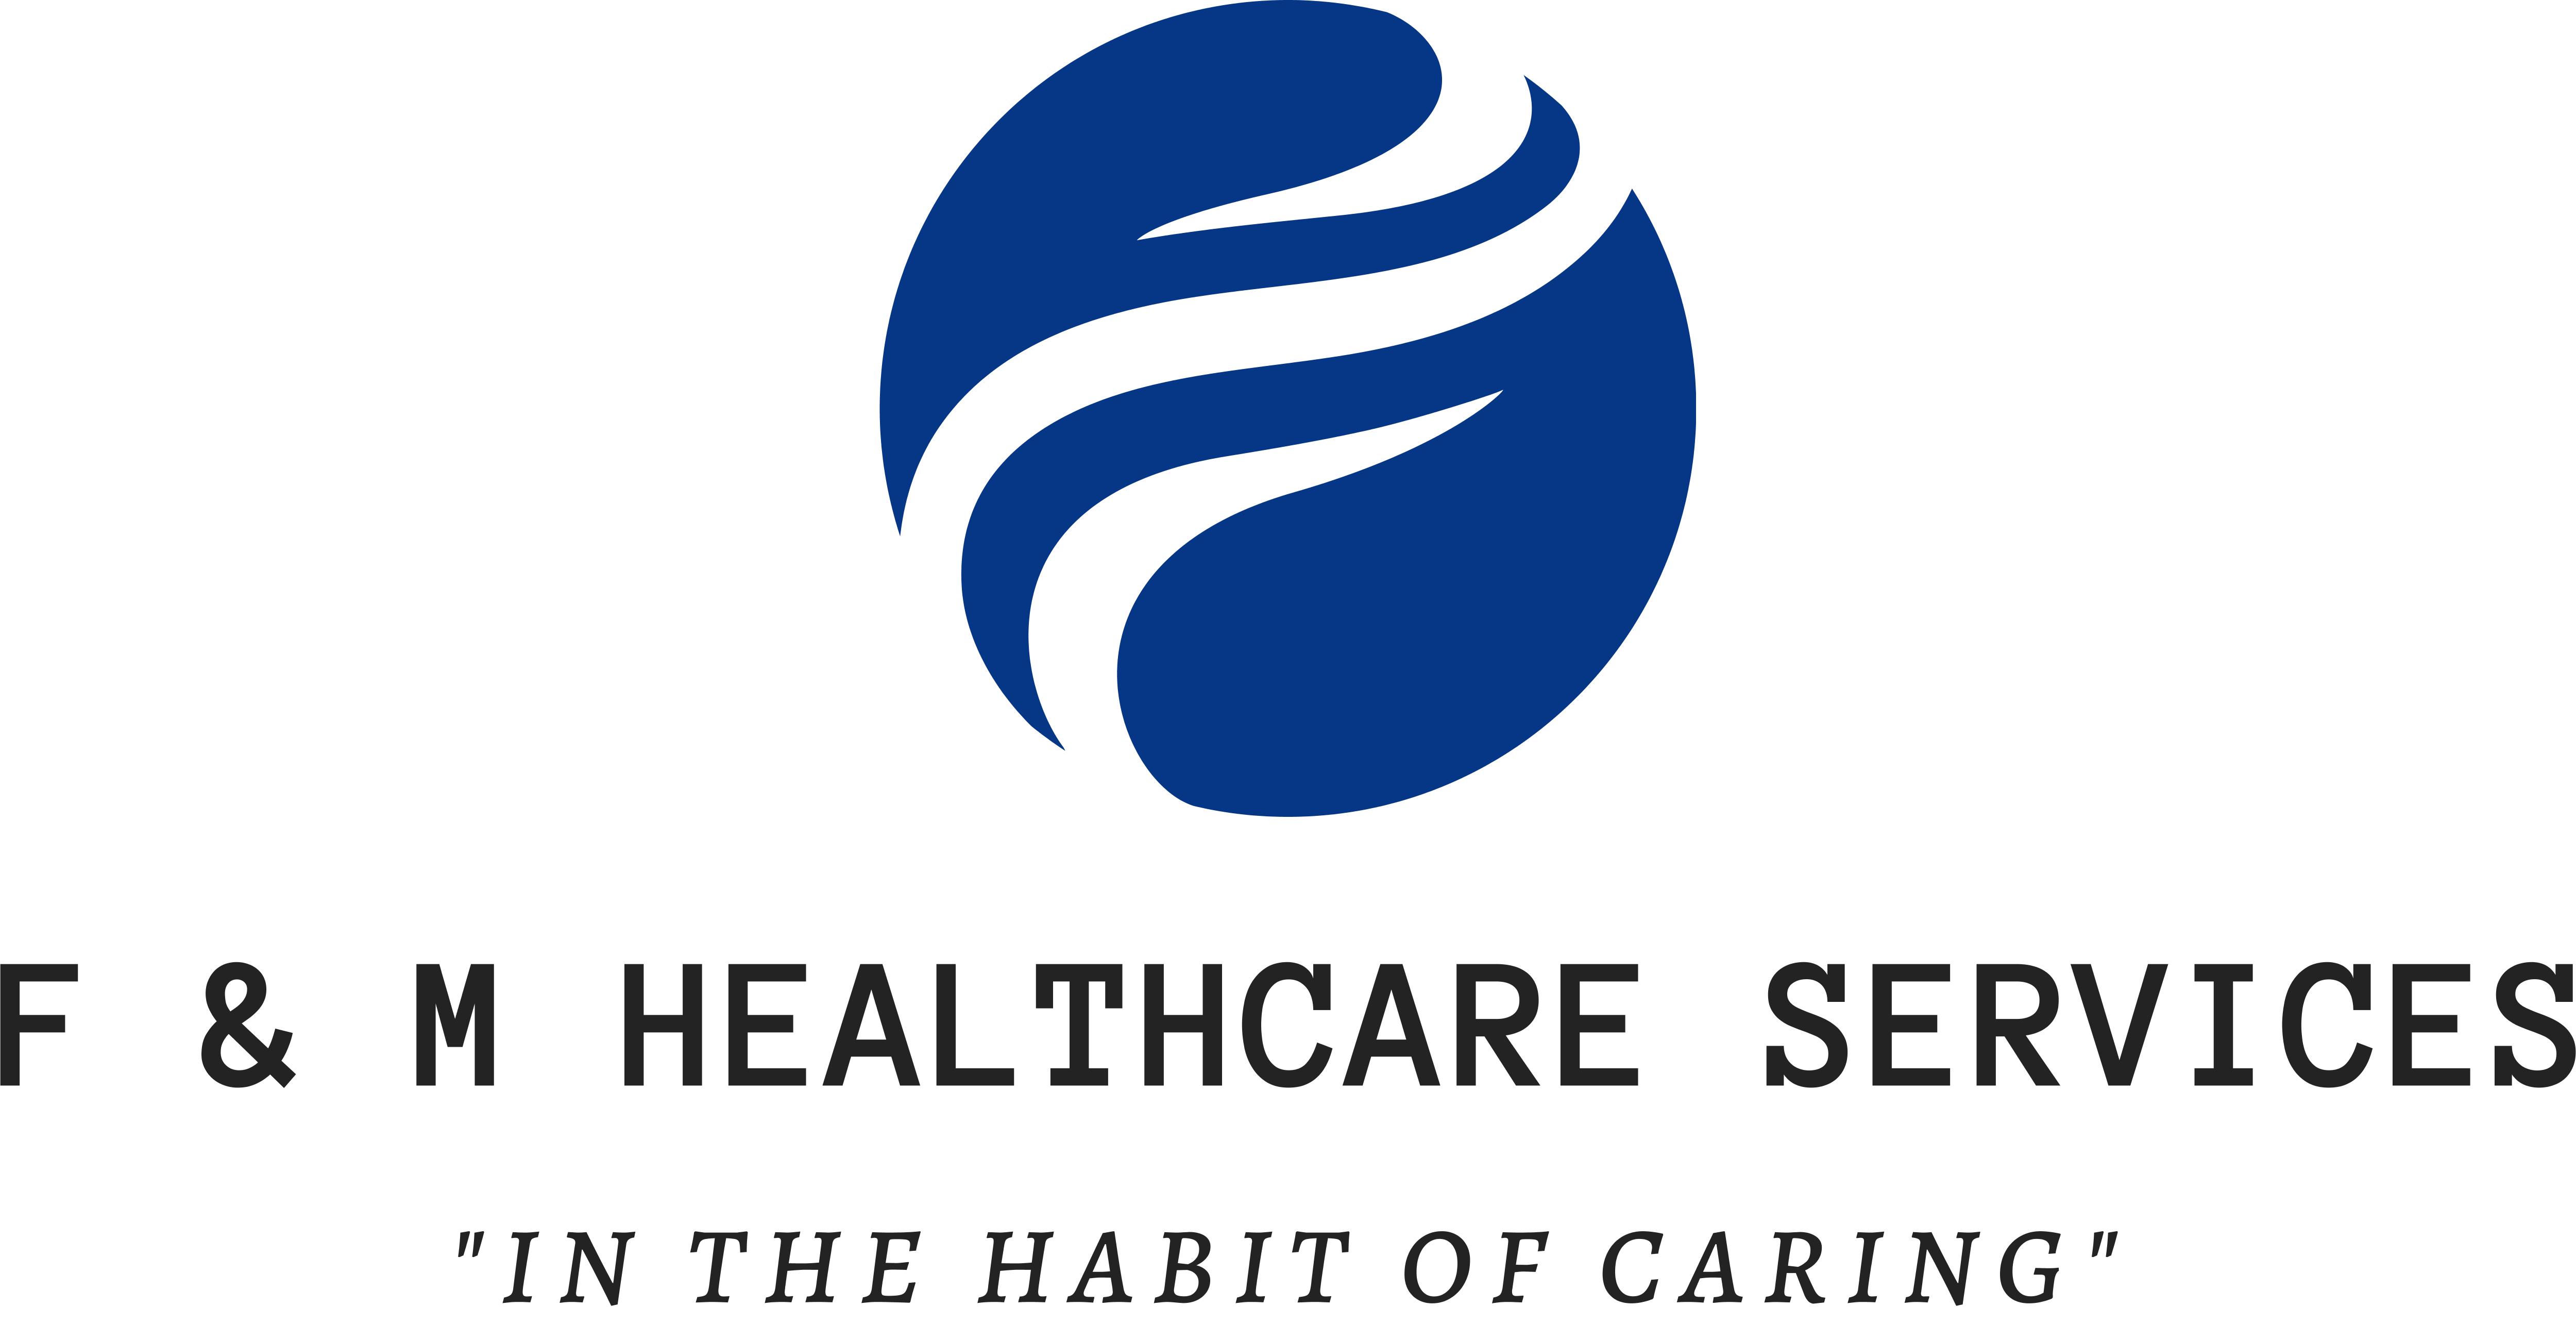 Cpr Certification Healthcare Training In Ohio Fm Healthcare